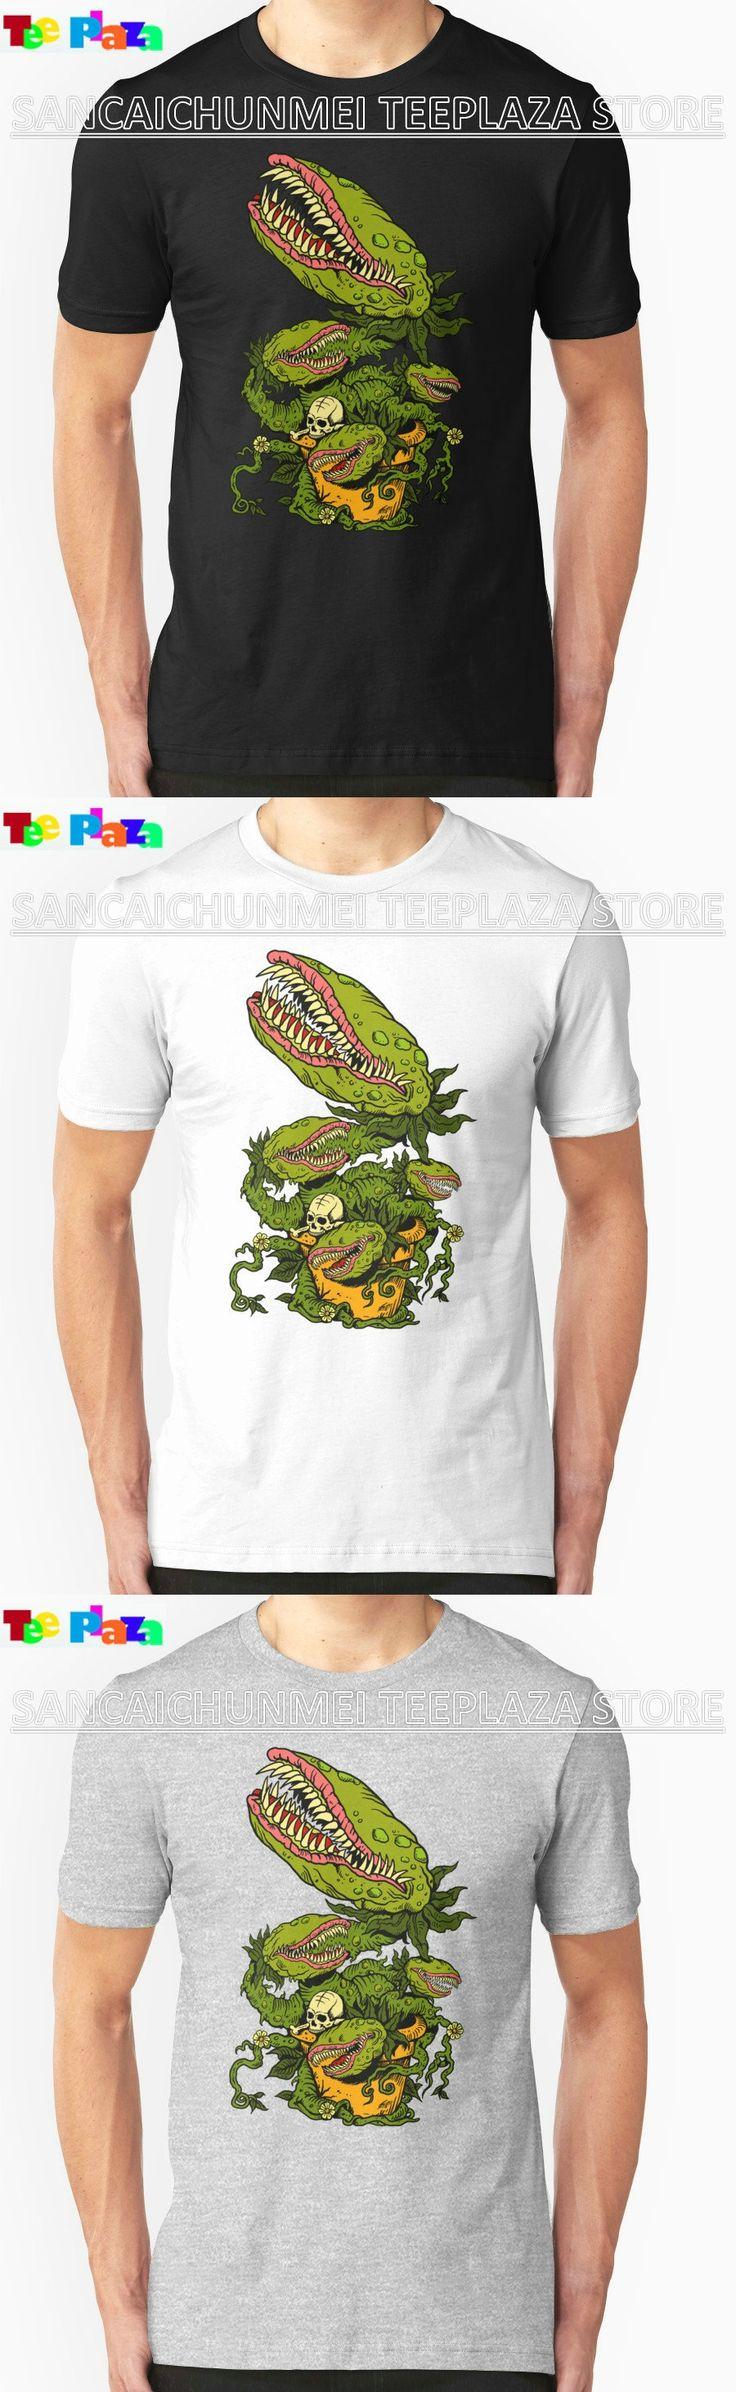 Teeplaza T Shirt Design Website Fashion Venus Fly Trap Men Short O-Neck T Shirts